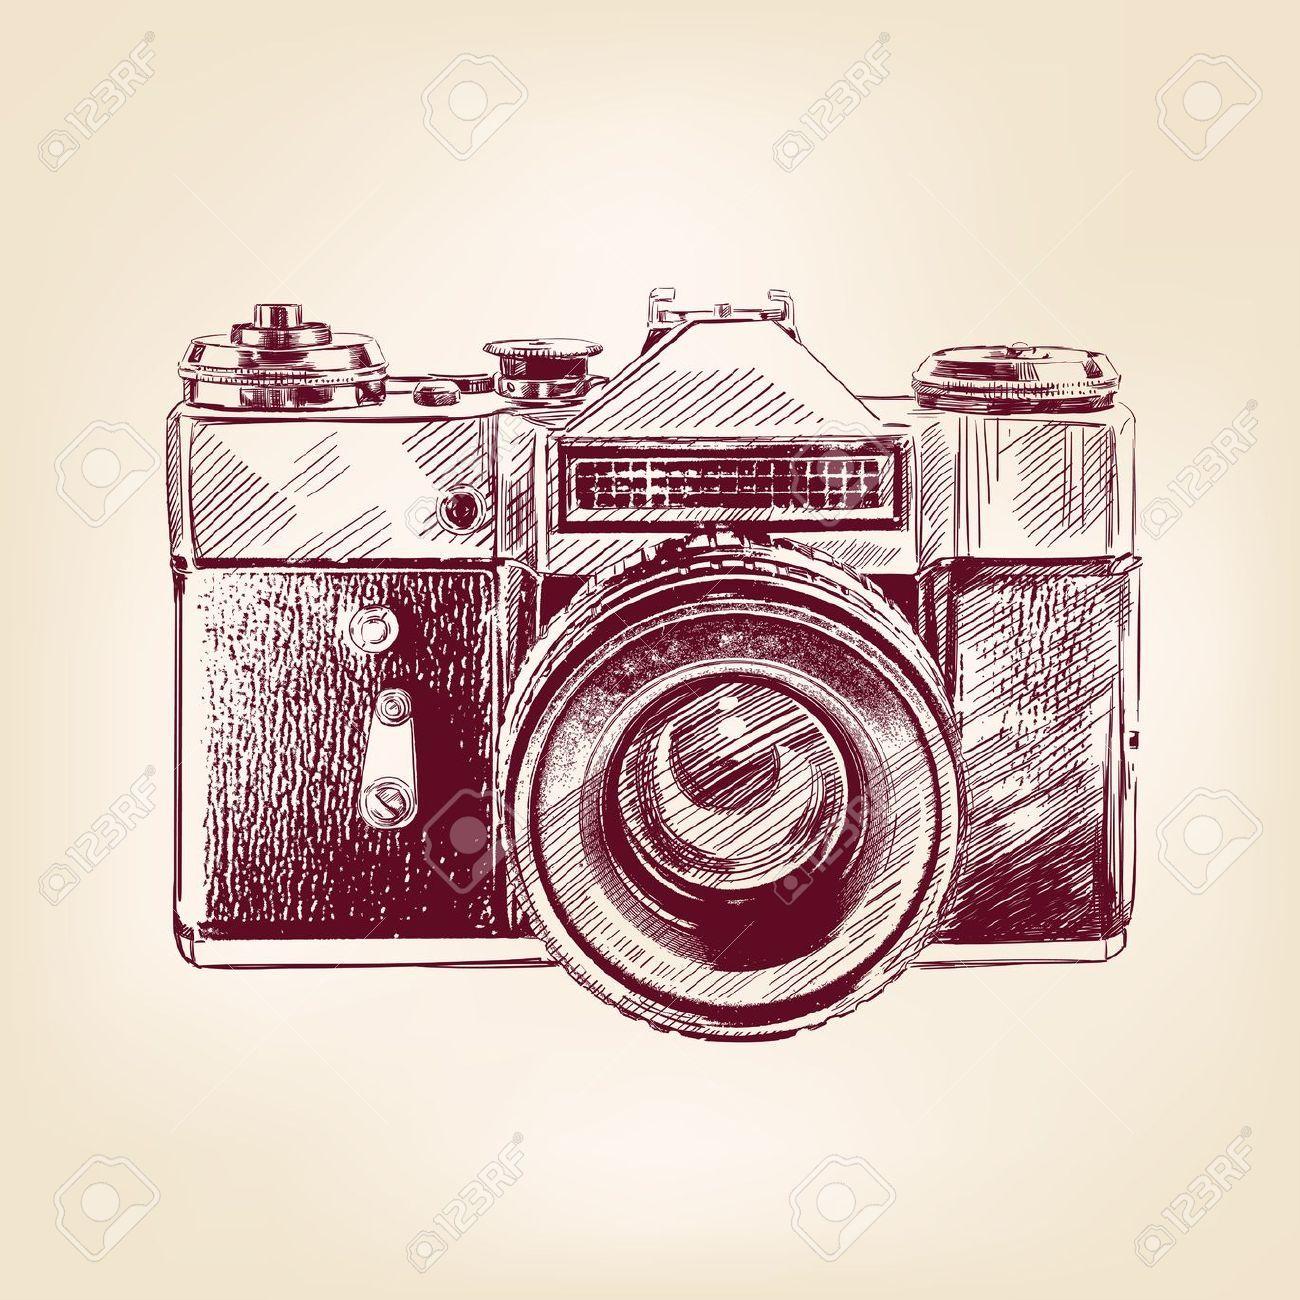 0195 retro vintage camcorder 8mm movie photo montage naked - 5 8